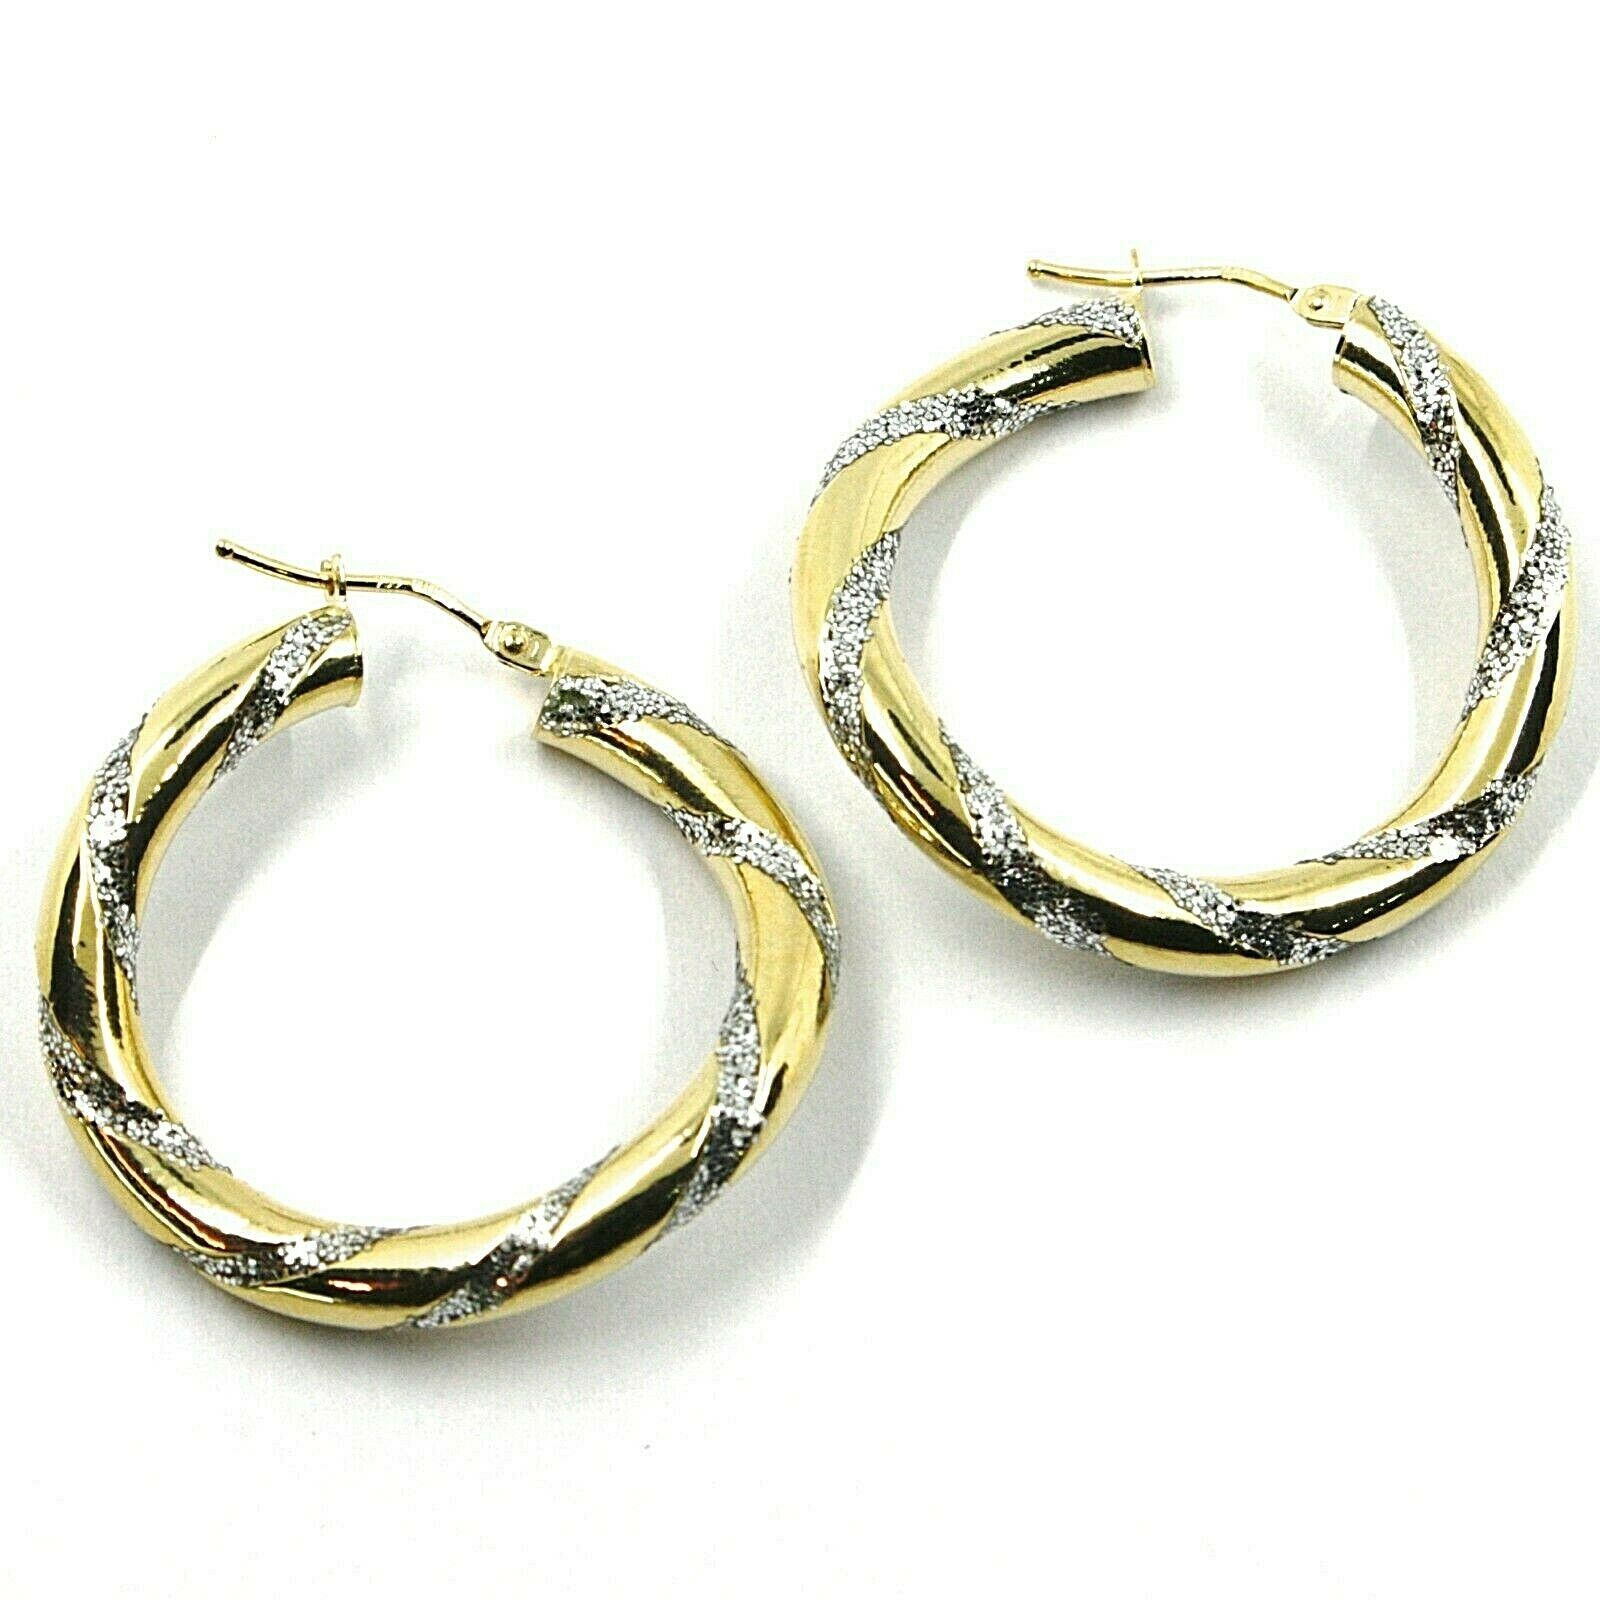 18K YELLOW WHITE GOLD CIRCLE HOOPS PENDANT EARRINGS, 3.1cmx4mm TWISTED, GLITTER